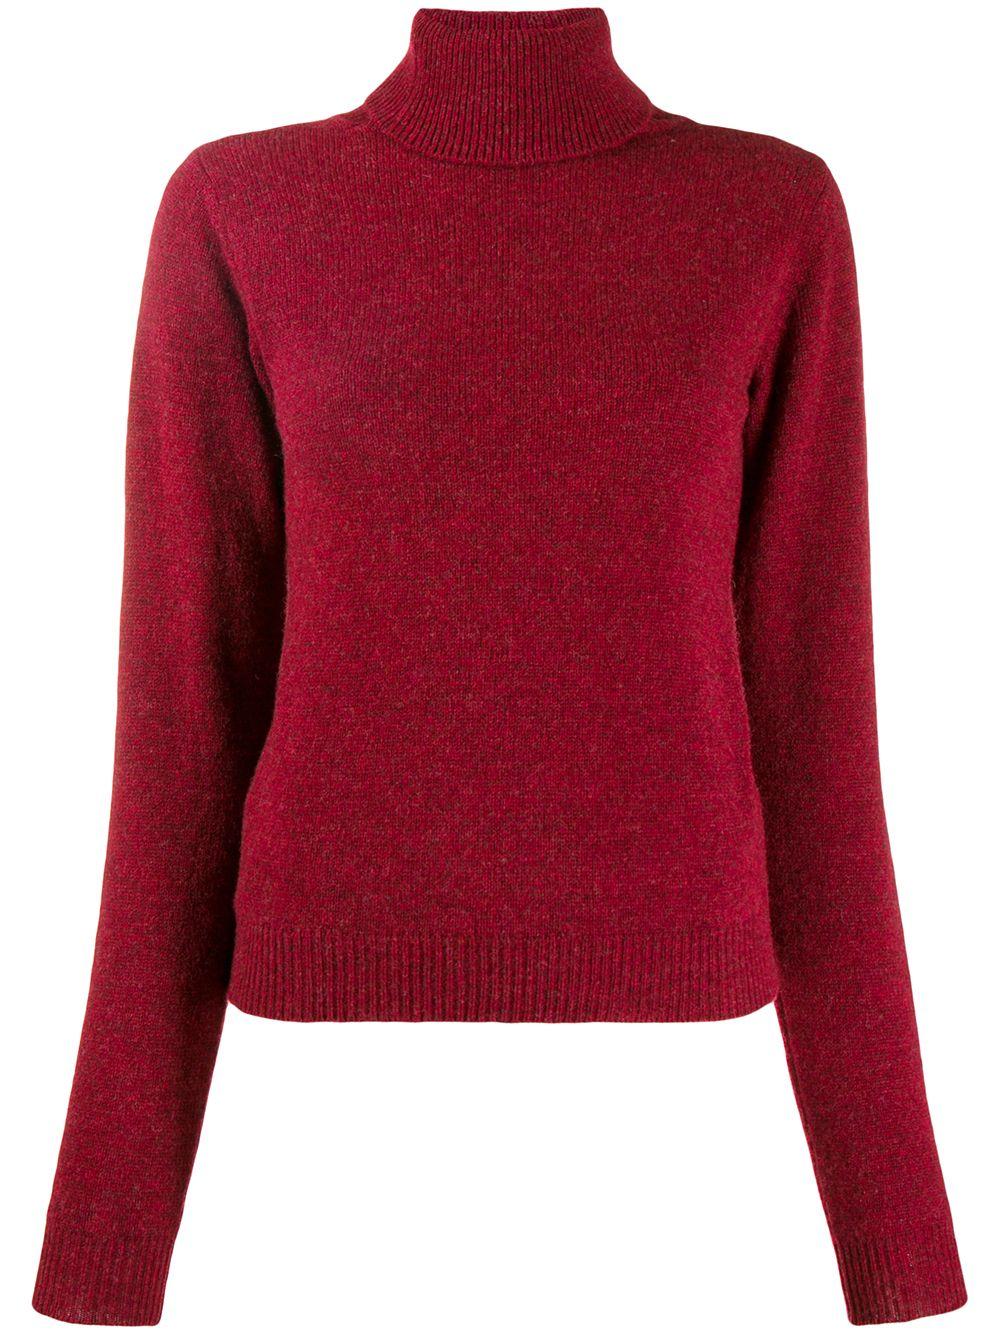 Highneck Sweater